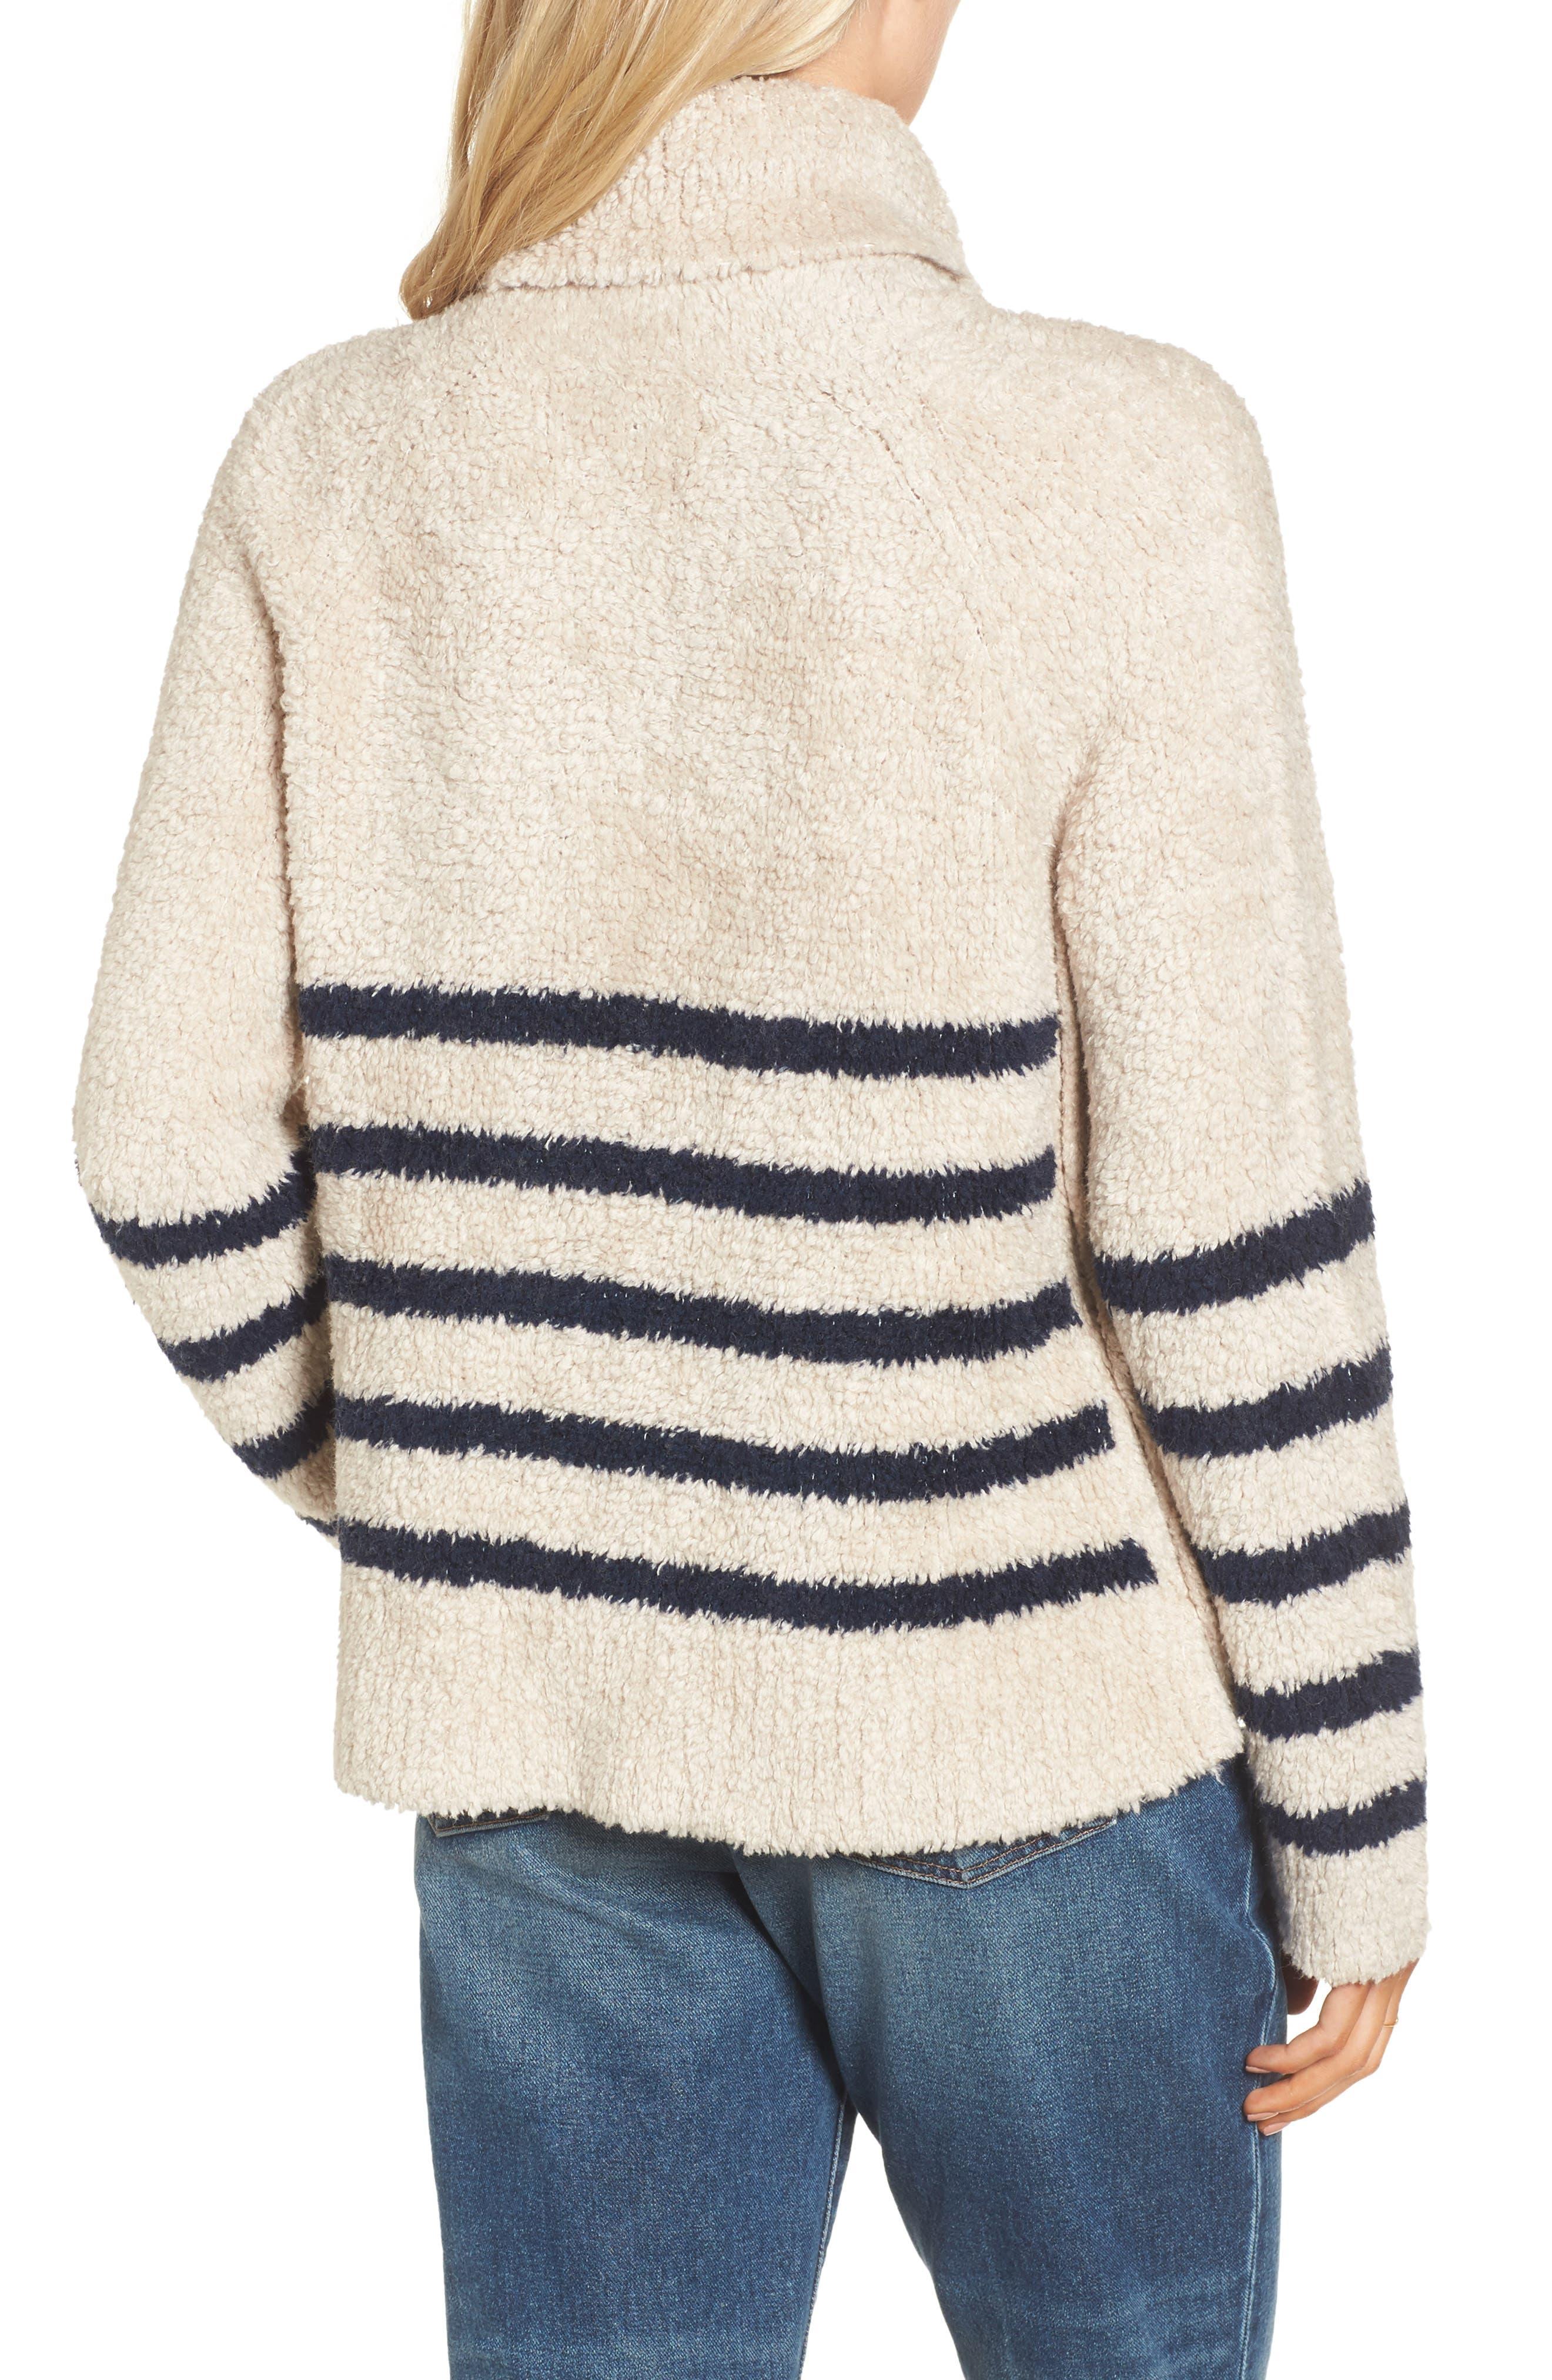 Mariner Stripe Turtleneck Sweater,                             Alternate thumbnail 2, color,                             090